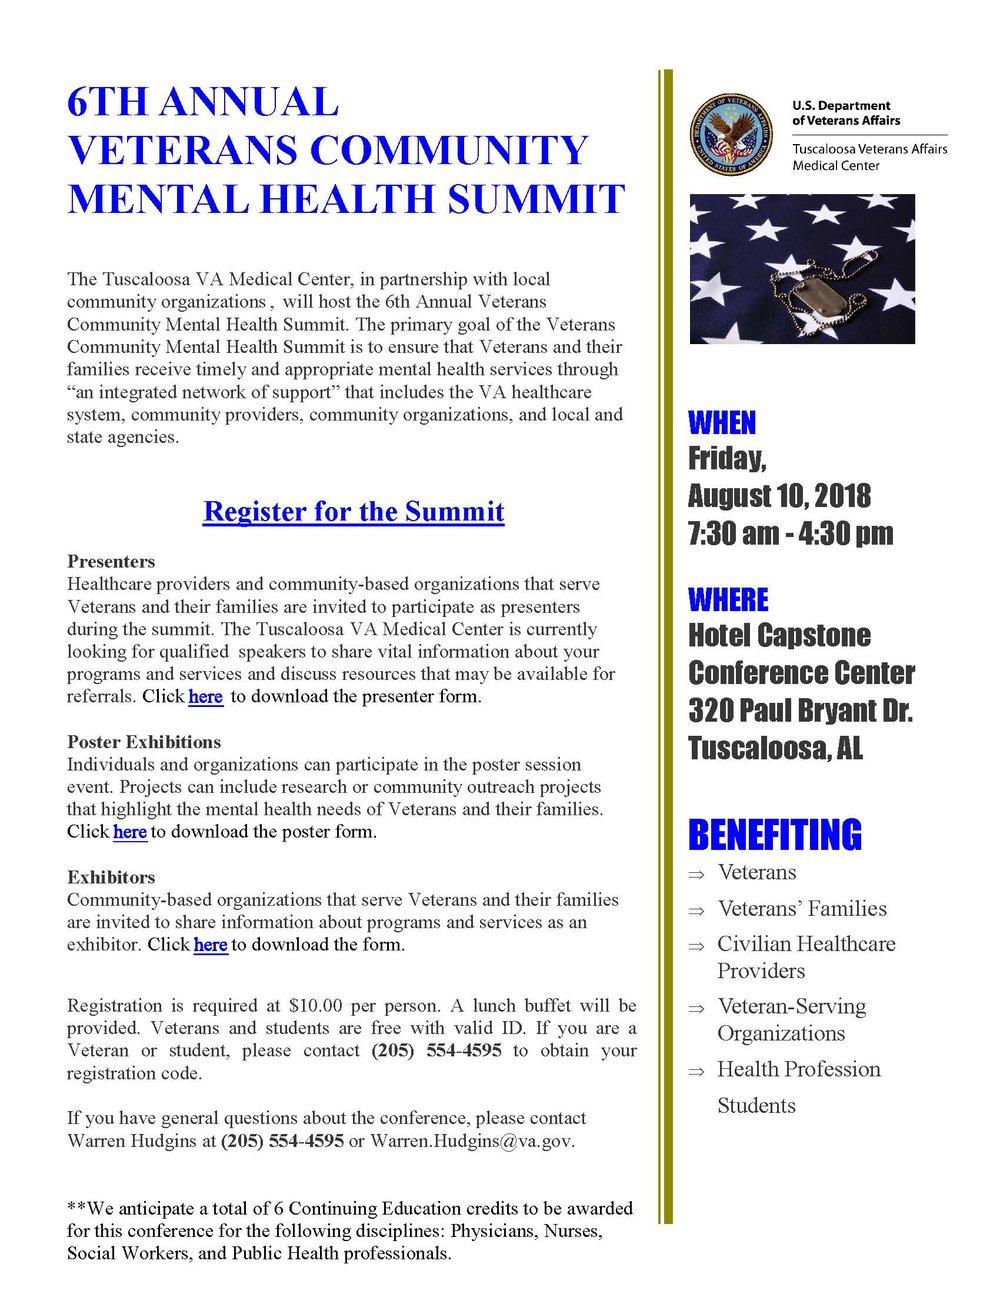 2018 VMH Summit Flyer Electronic Version 05.18.18 (1).jpg